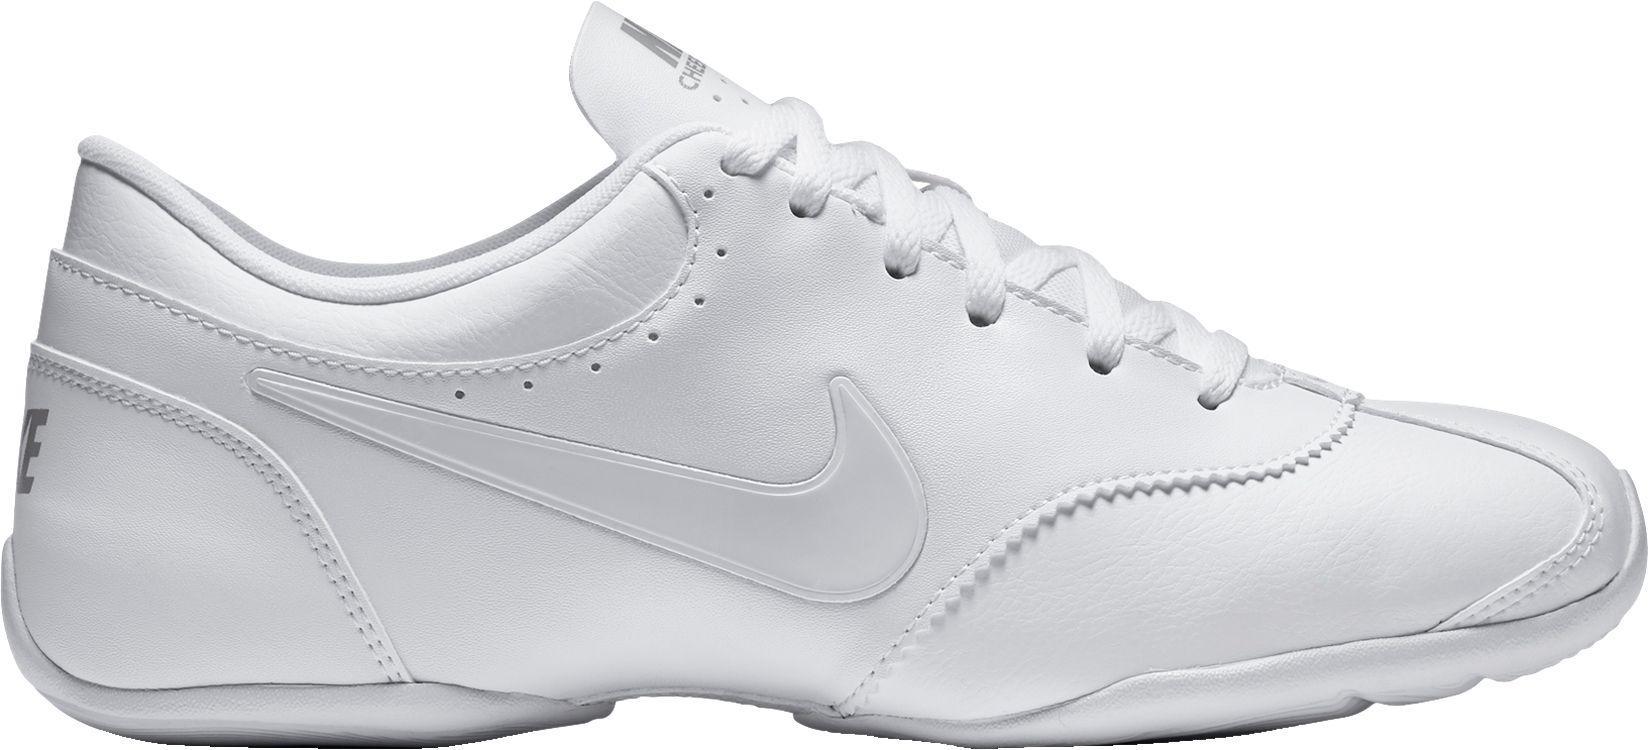 Optimismo Comprensión Bigote  Nike Synthetic Cheer Unite Cheerleading Shoes in White - Lyst